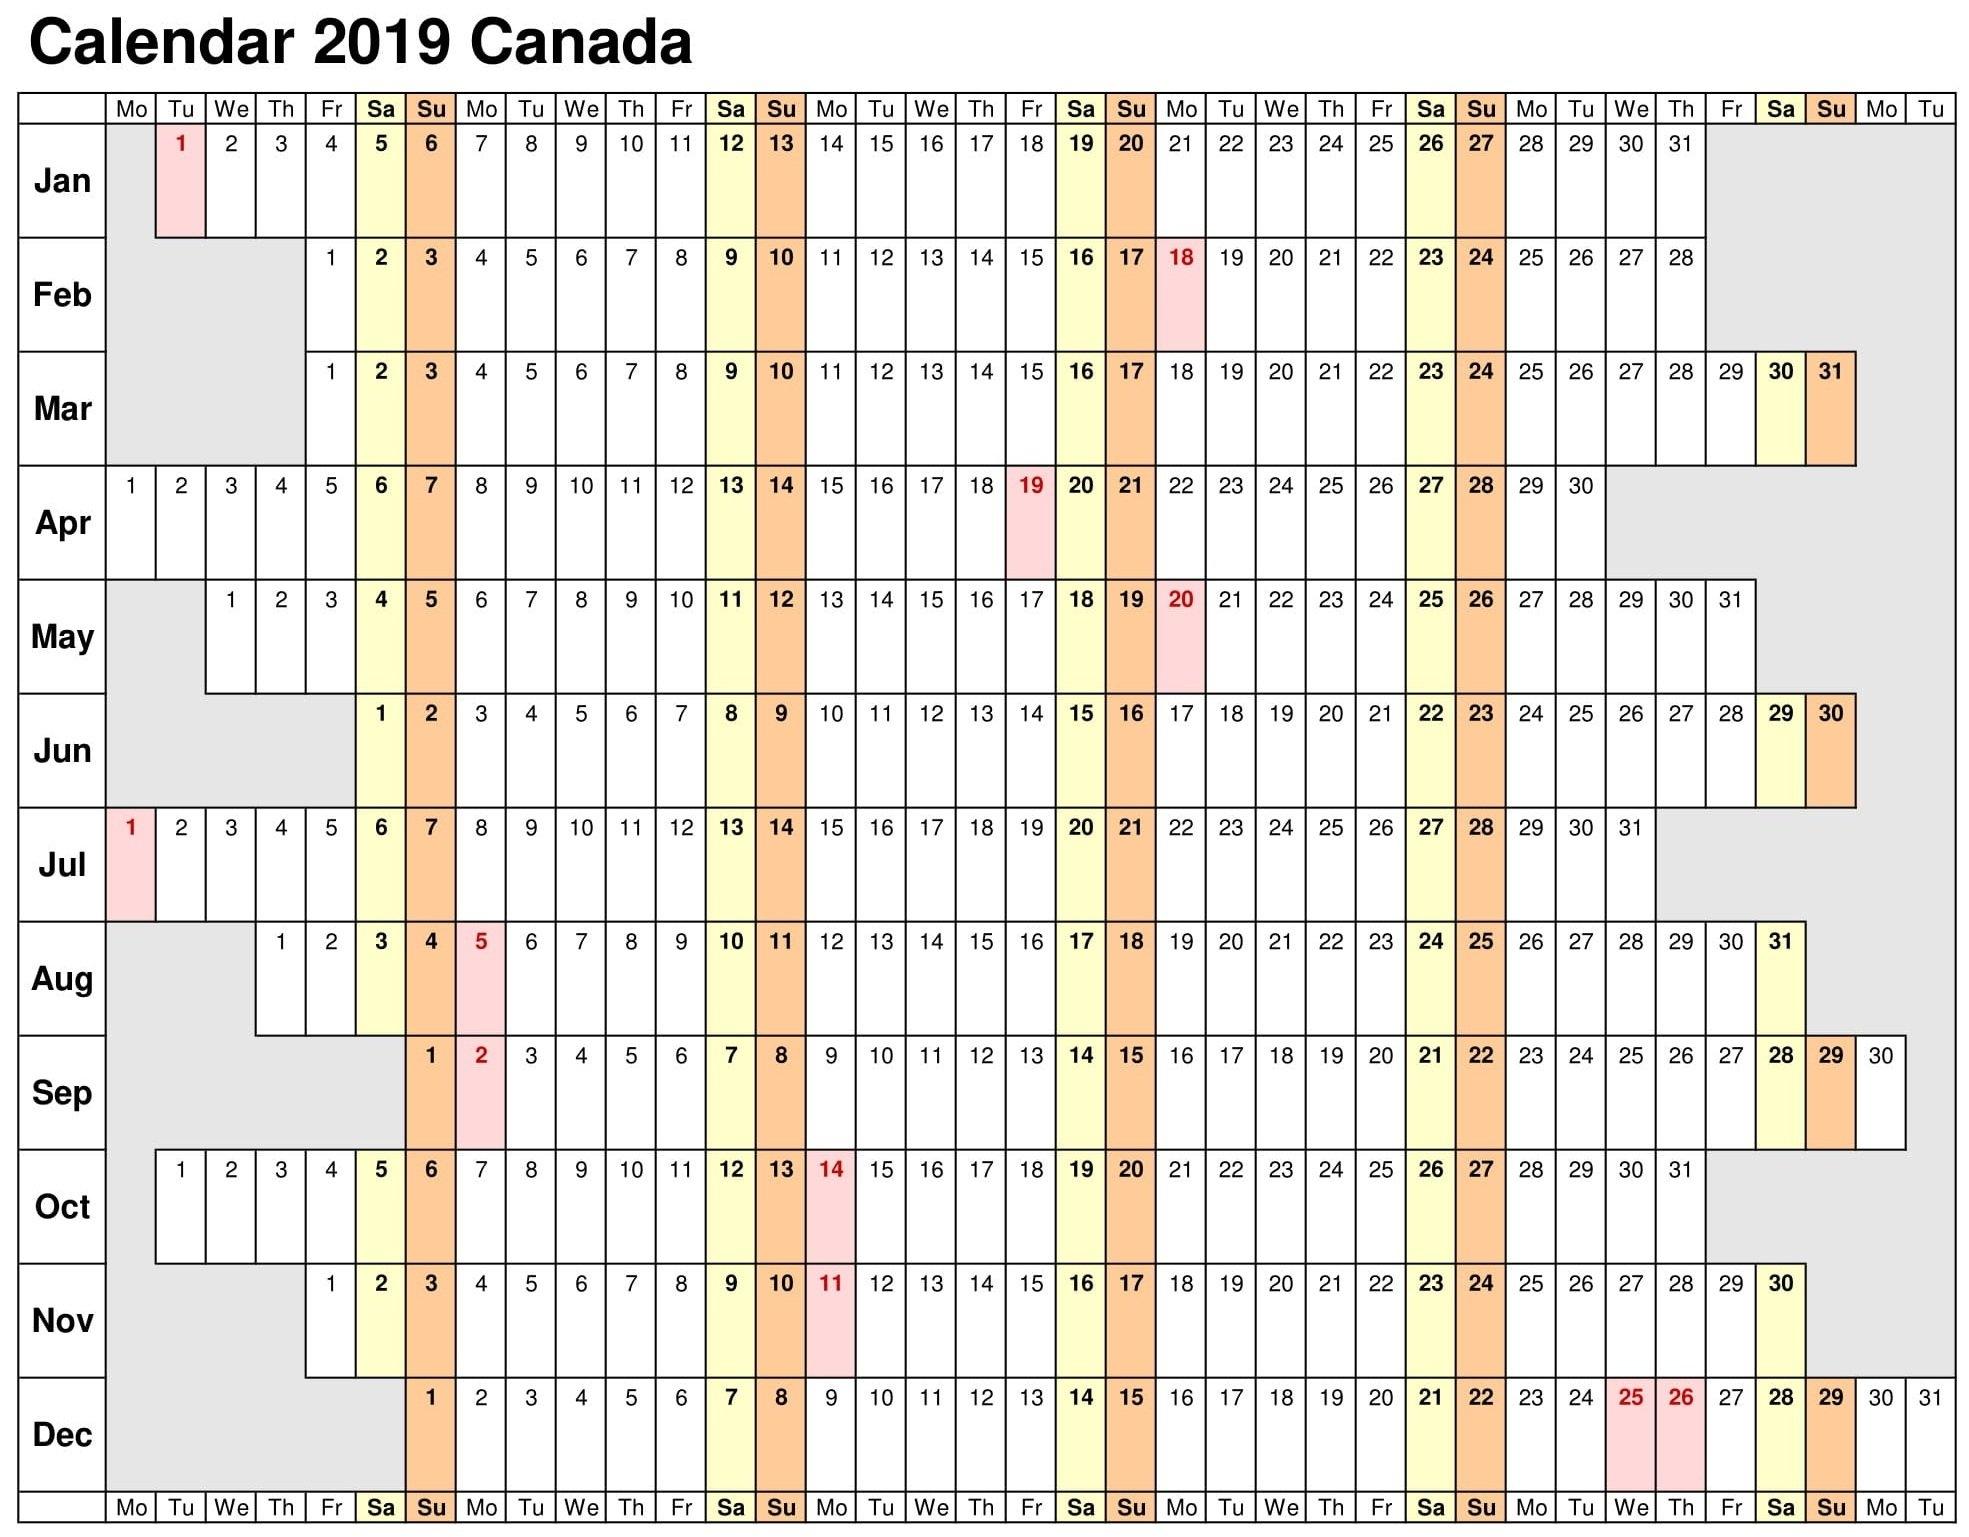 Calendar Template 2019 Excel – Free Calendar Templates & Worksheets Calendar 2019 Excel Free